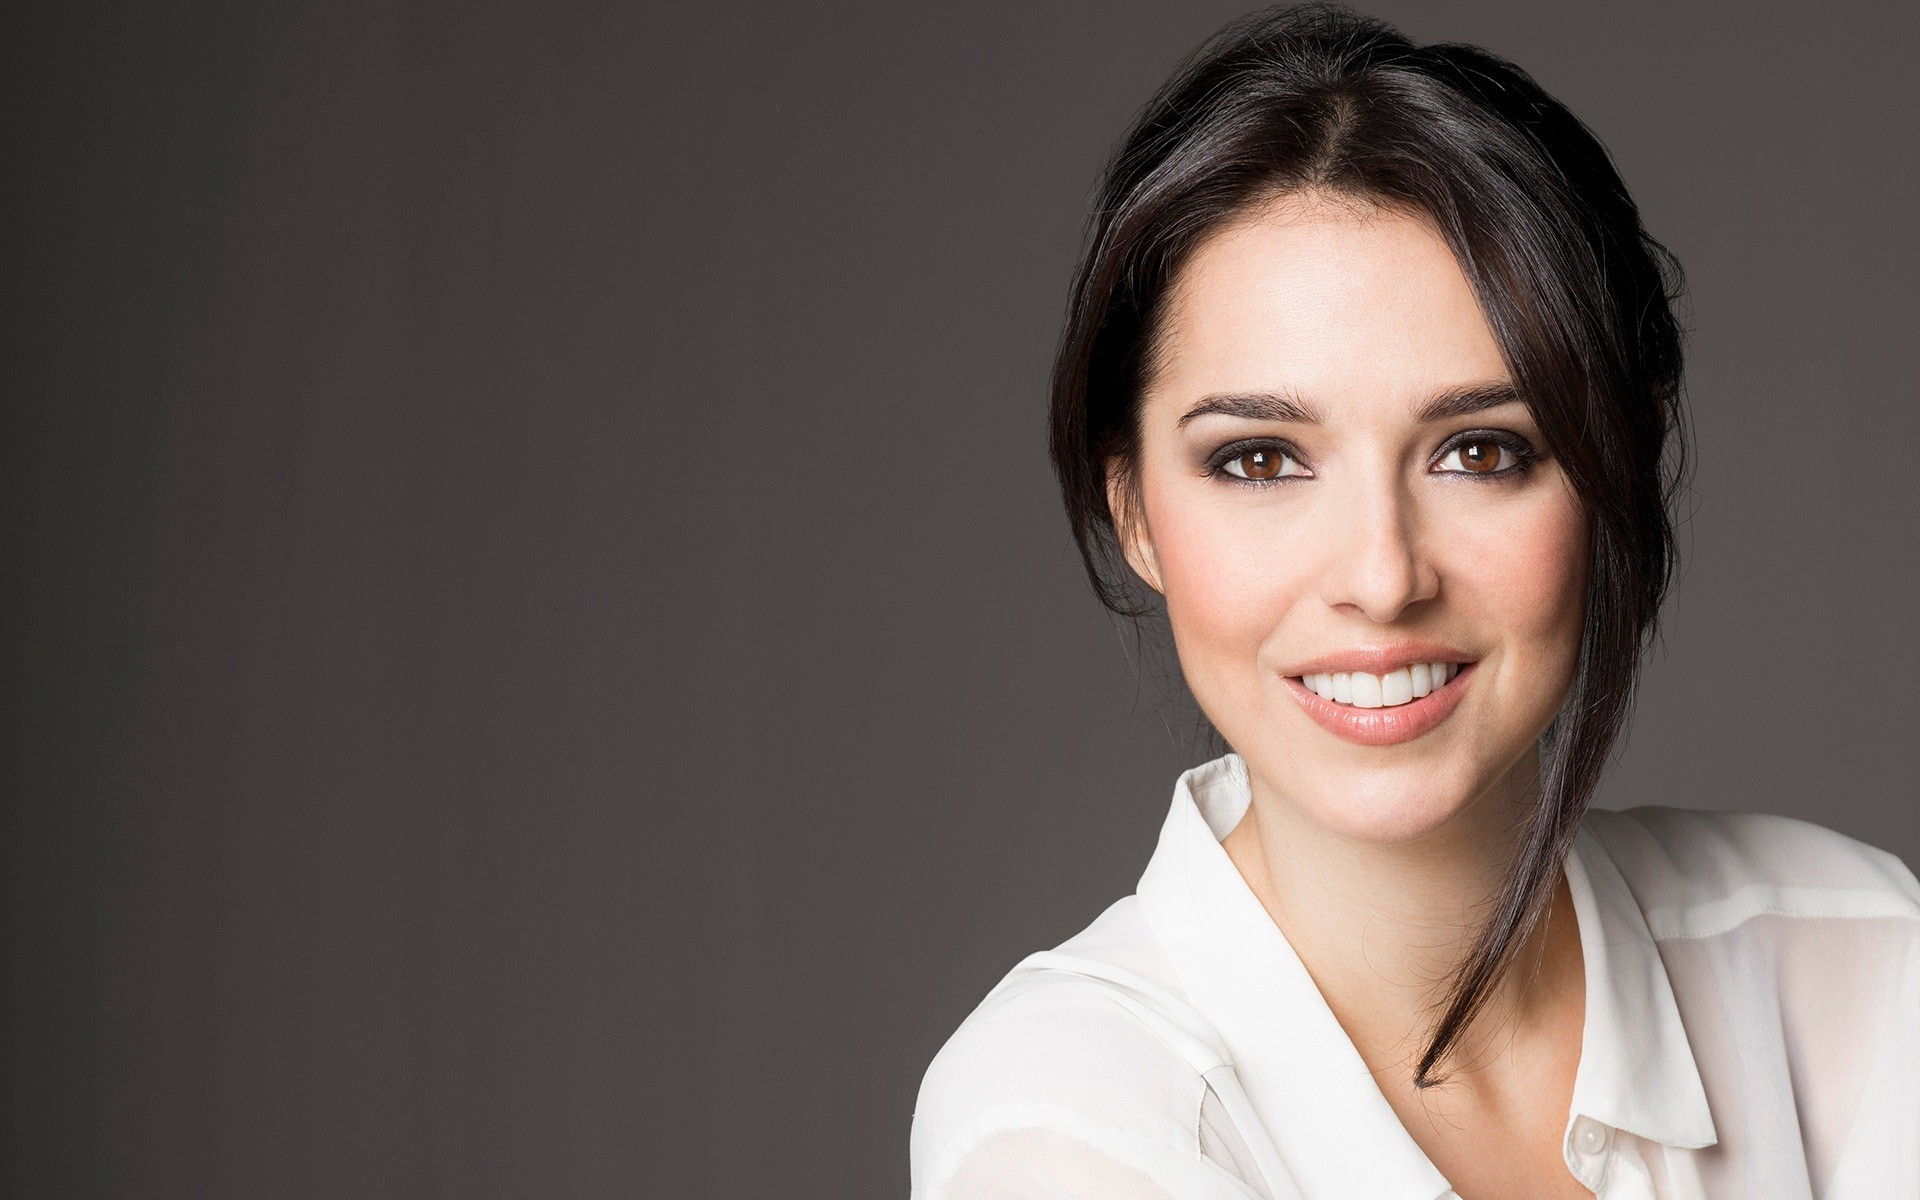 Res: 1920x1200, Cristina Brondo, Actress, Portrait, Smile